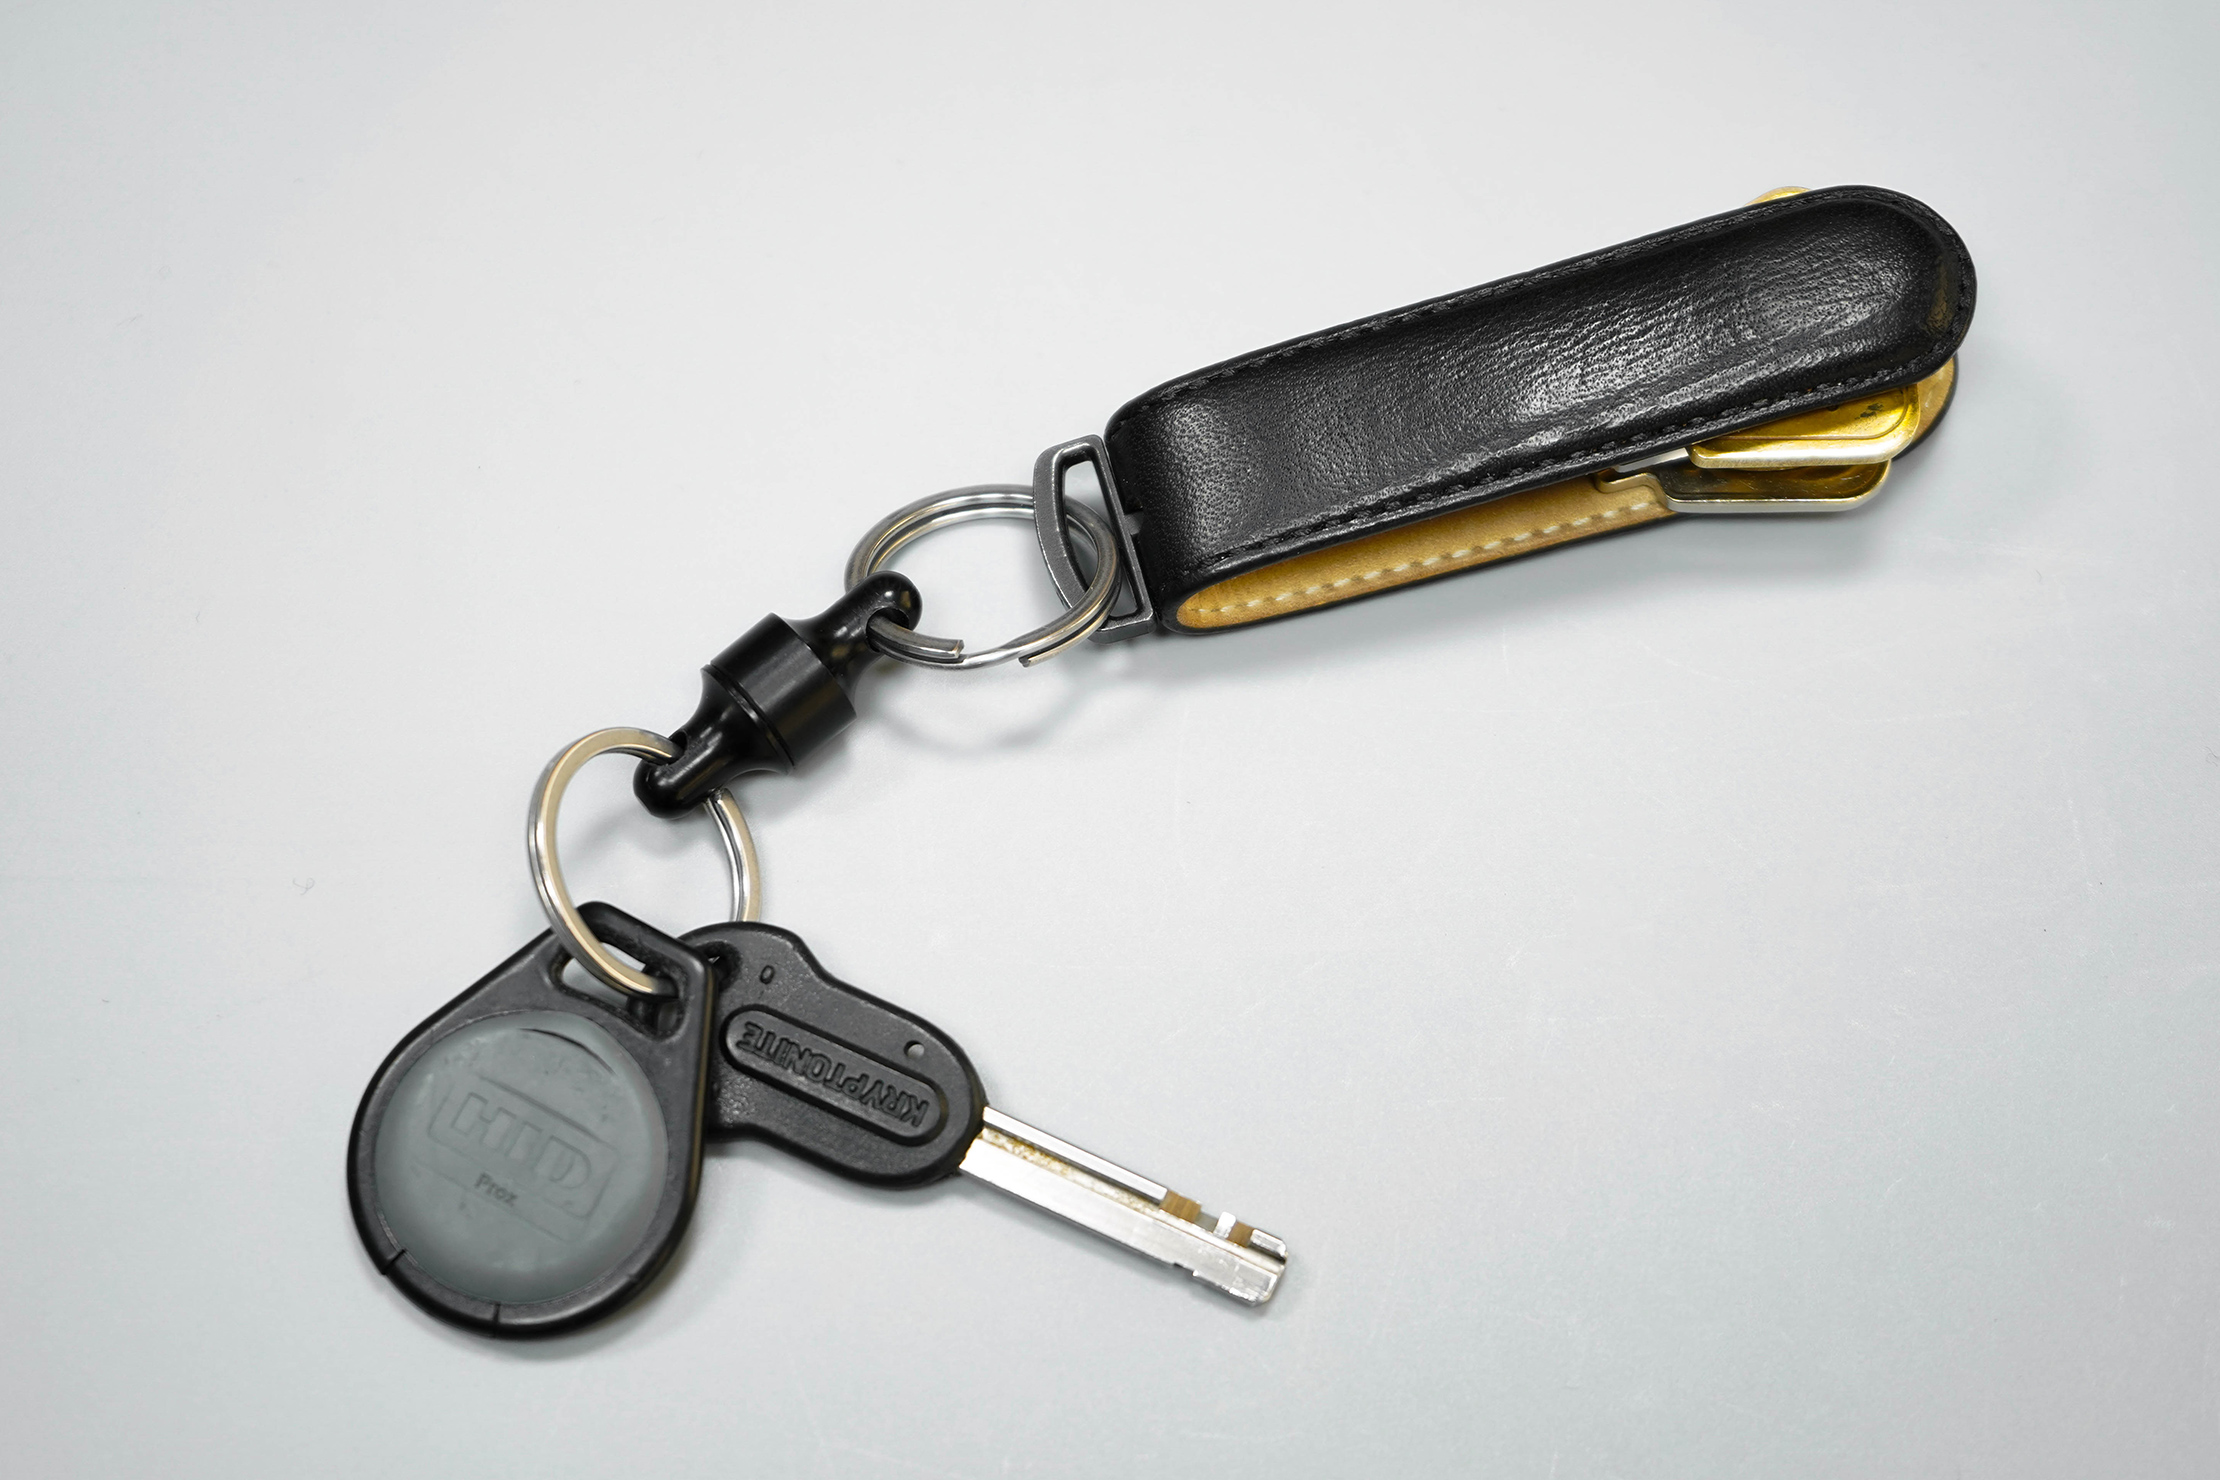 Jibbon Key Organizer On Keys